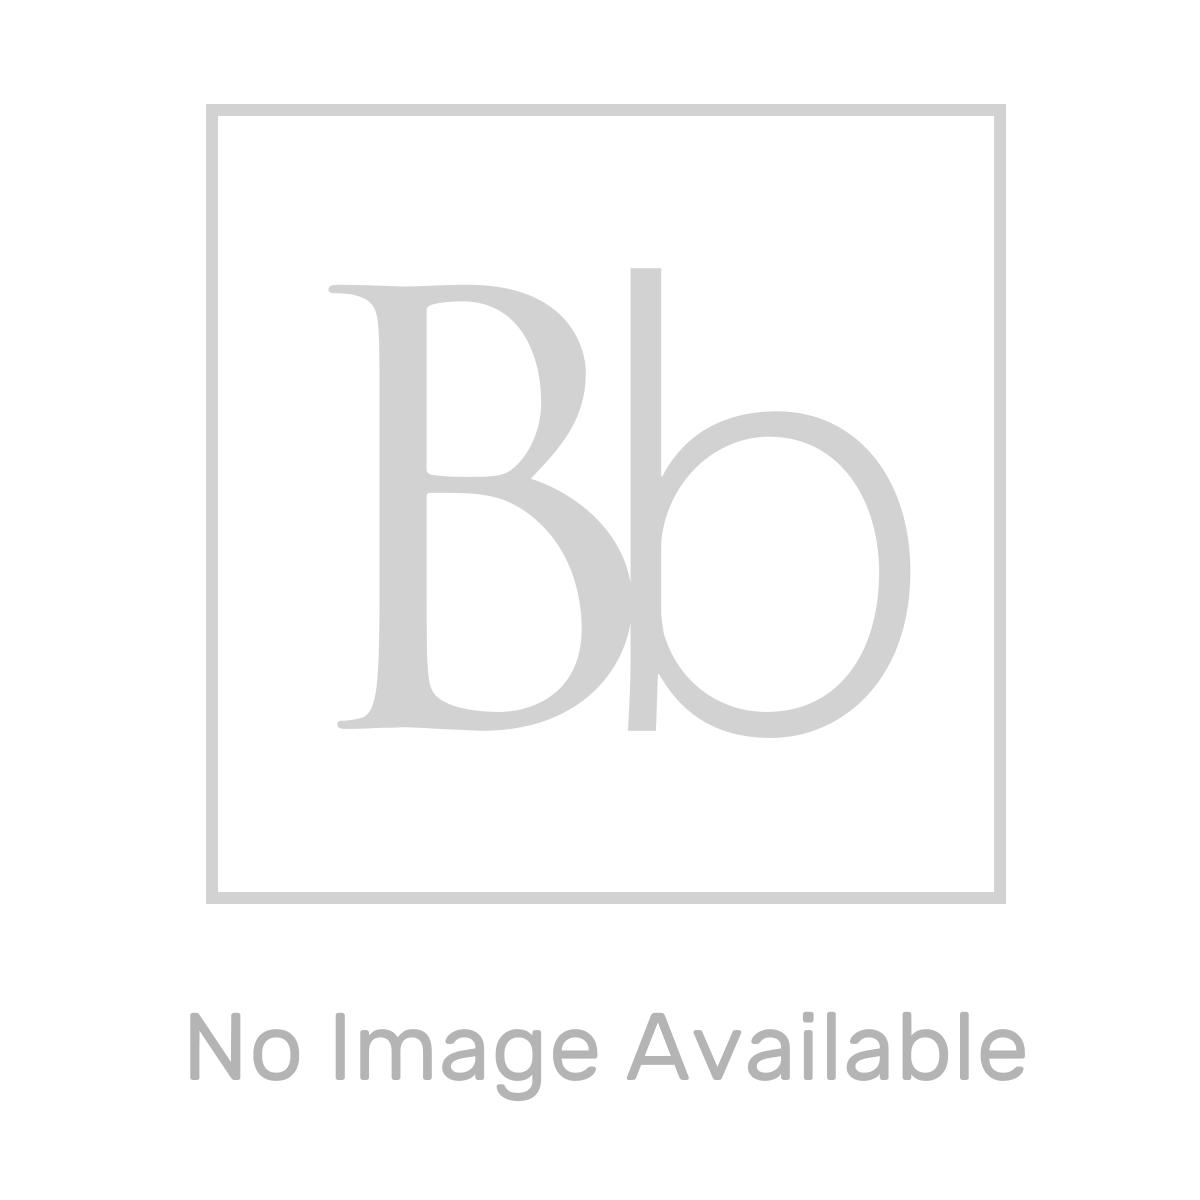 Premier Athena Driftwood End Panel 800mm